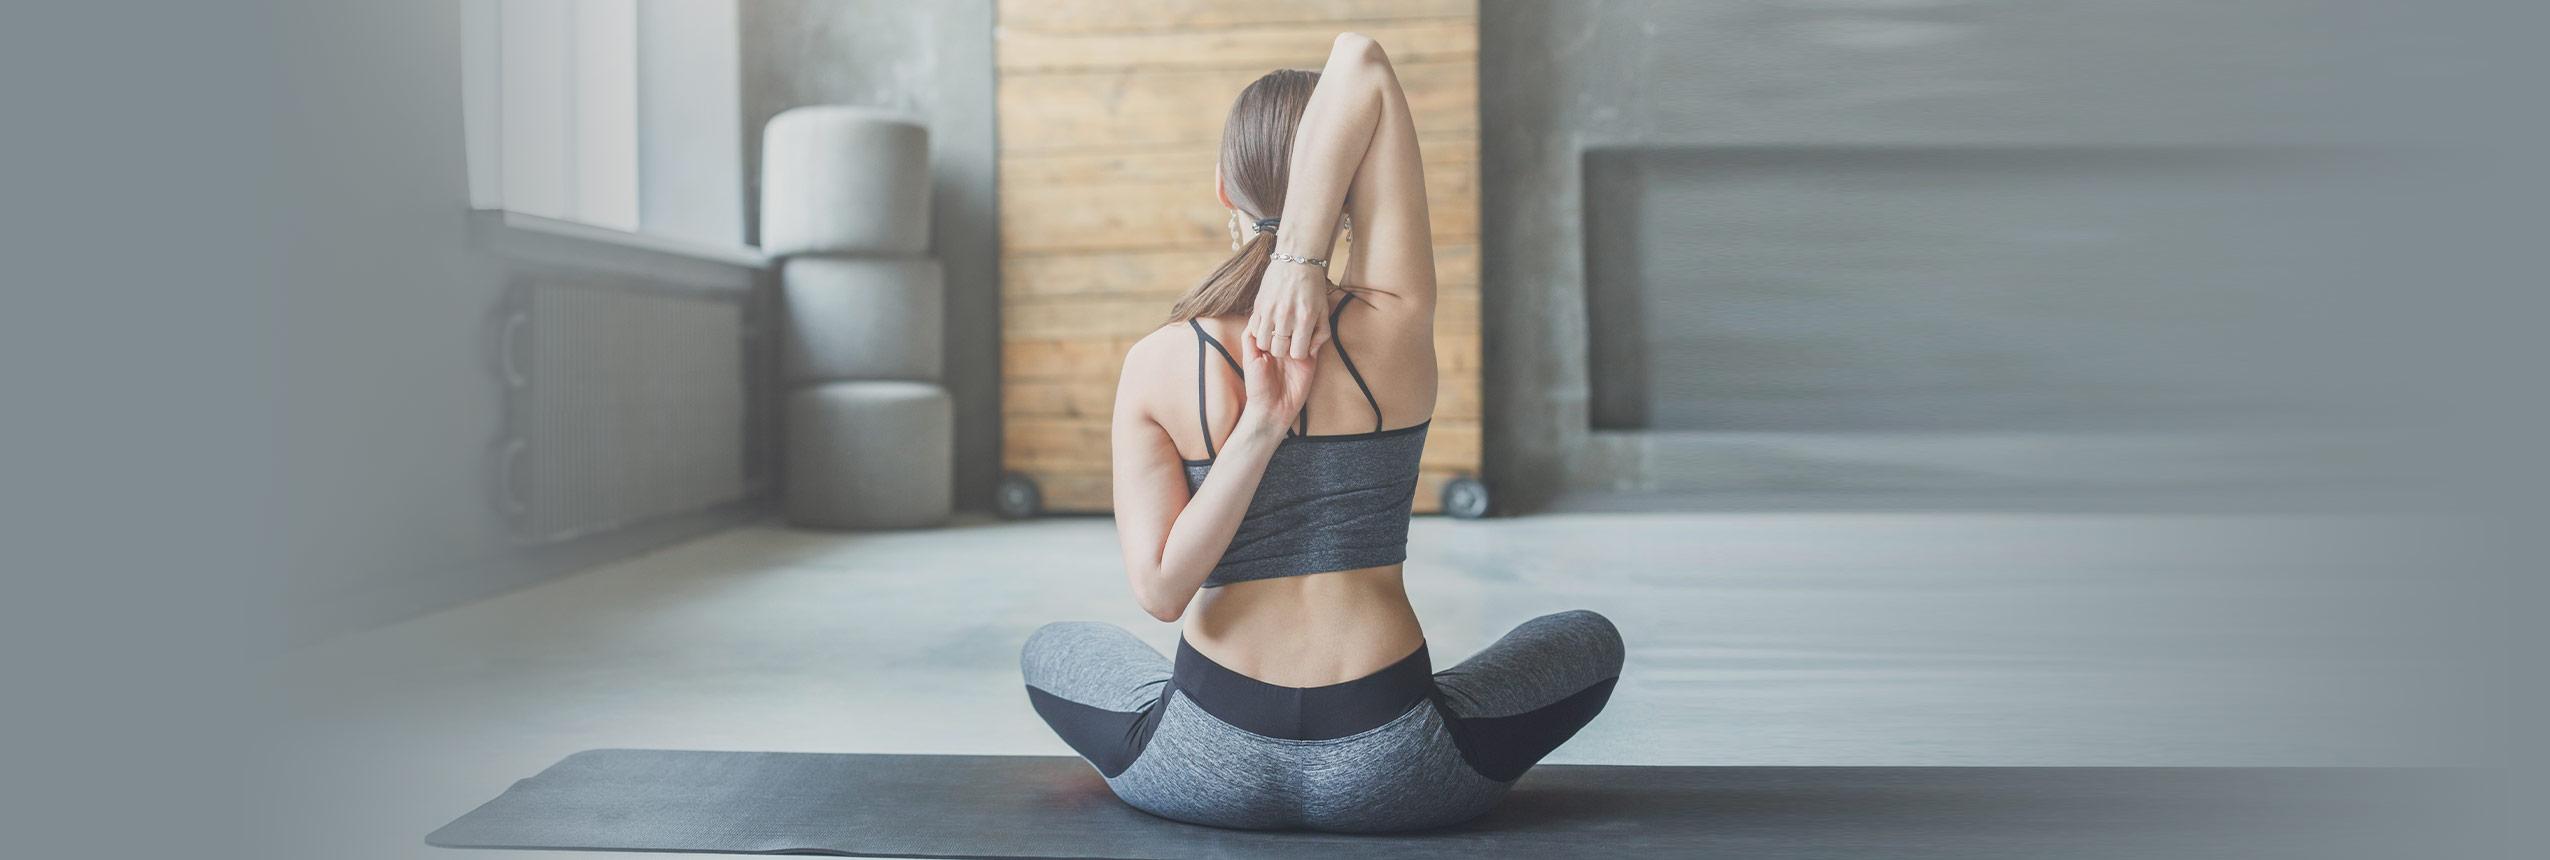 rueckenschmerzen muenchen orthopaede - Rückenschmerzen